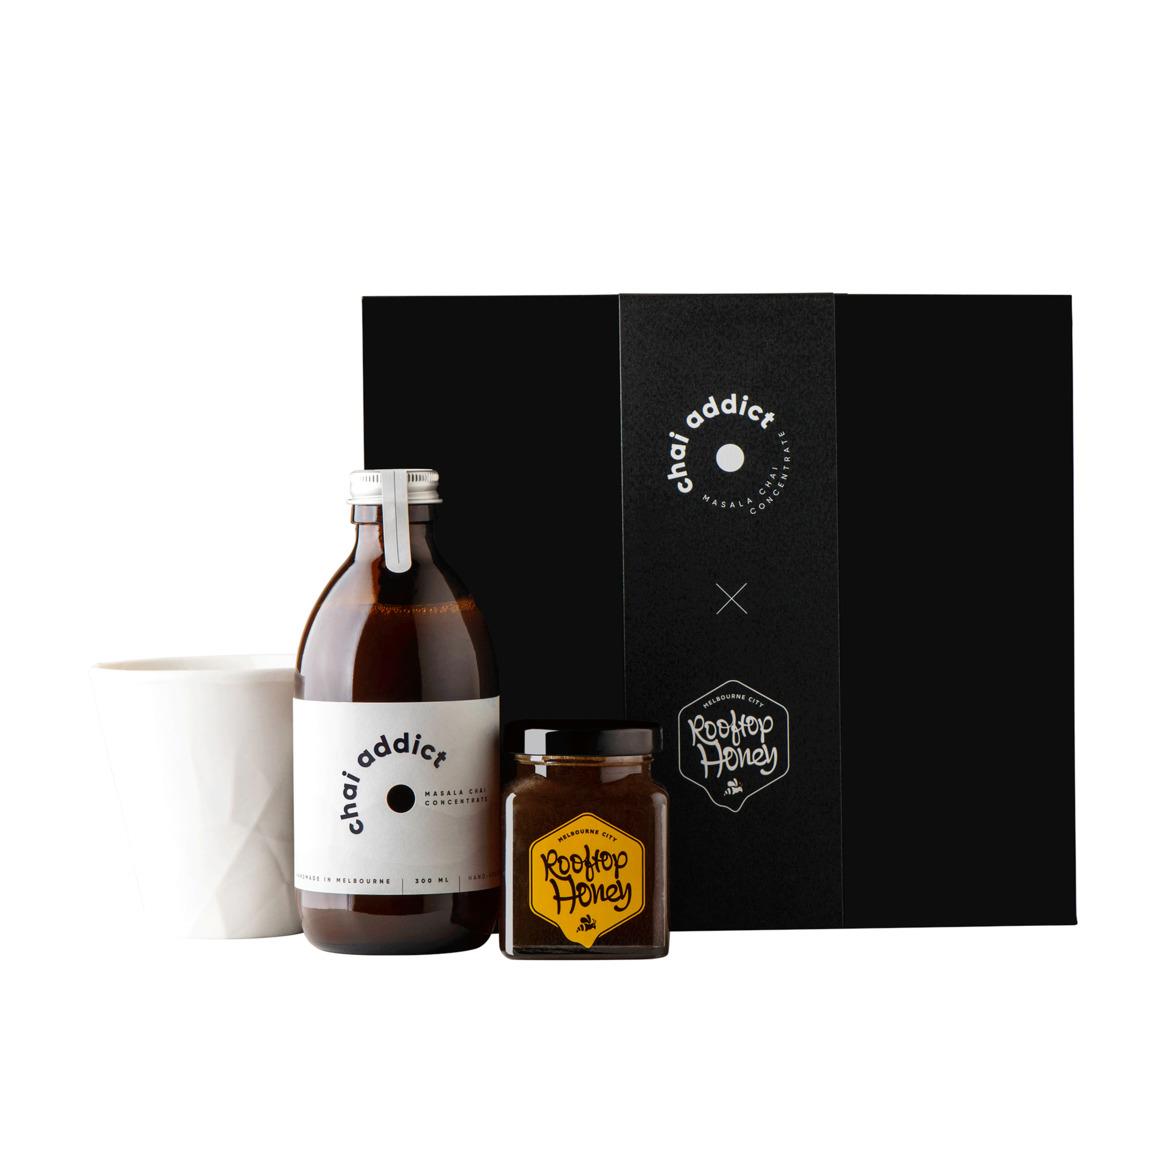 Chai addict x rooftop honey gift box (starter box) | Trada Marketplace